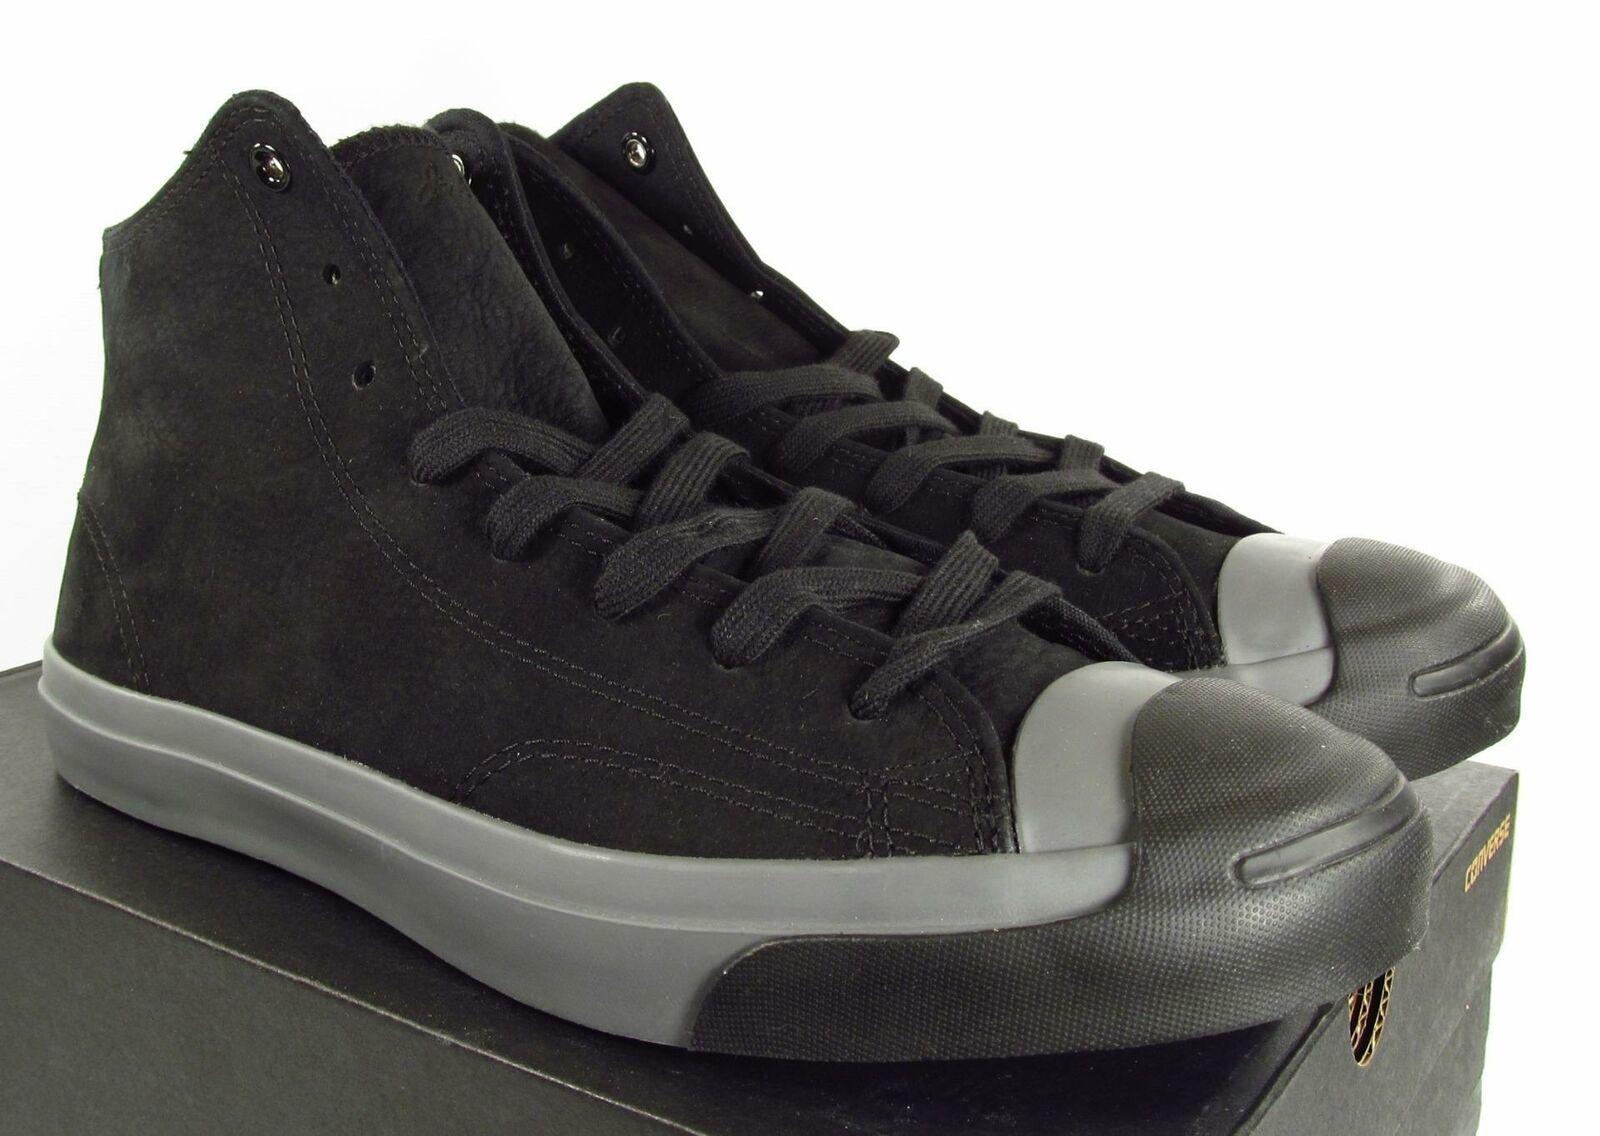 Converse Jack Purcell JP JACK MID Black Suede Leather 149924C (Men's 10.5)